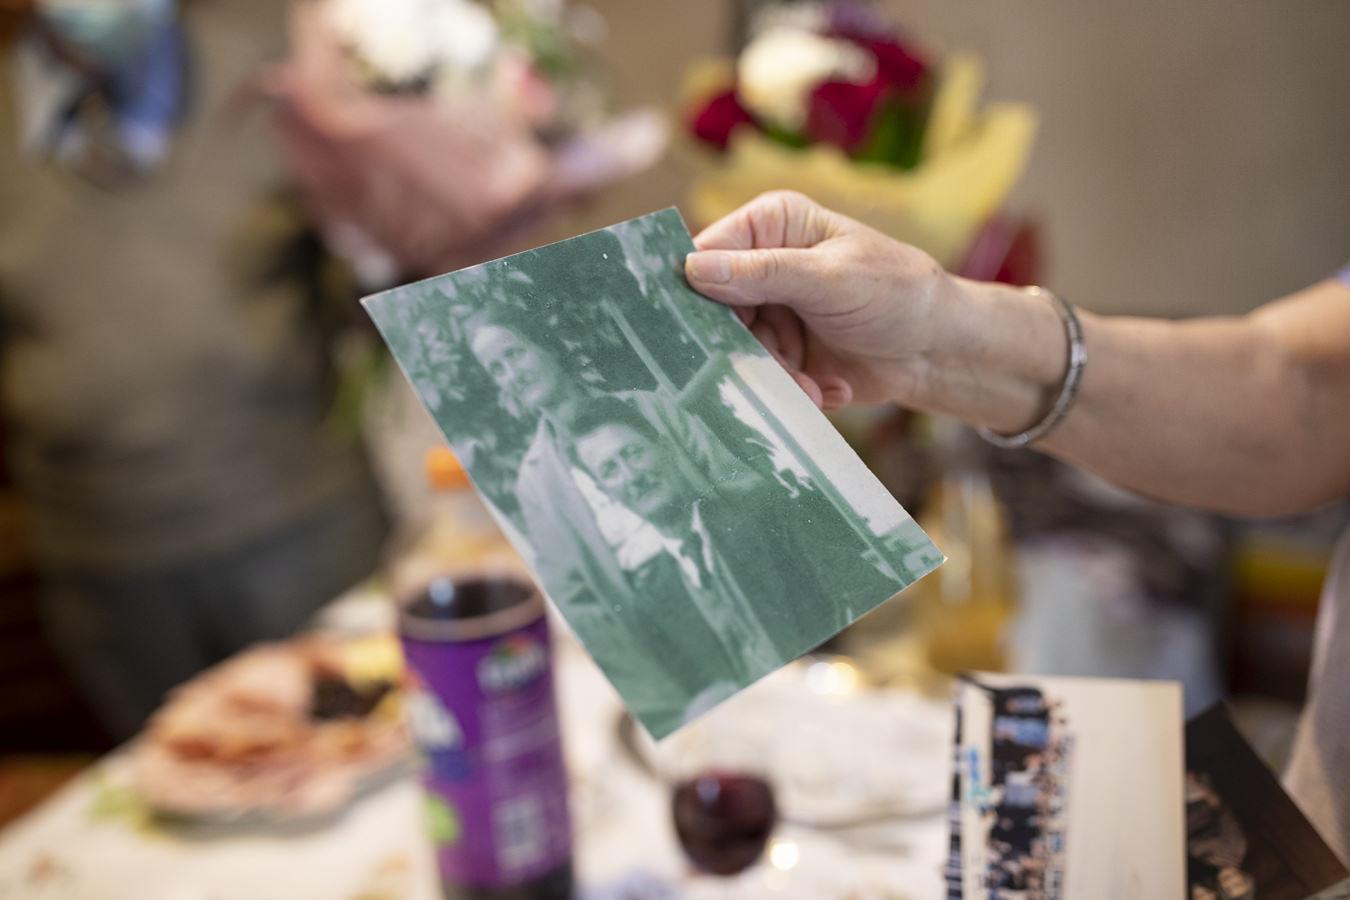 A împlinit 106 ani și ne-a invitat la ziua ei! (fotoreportaj)